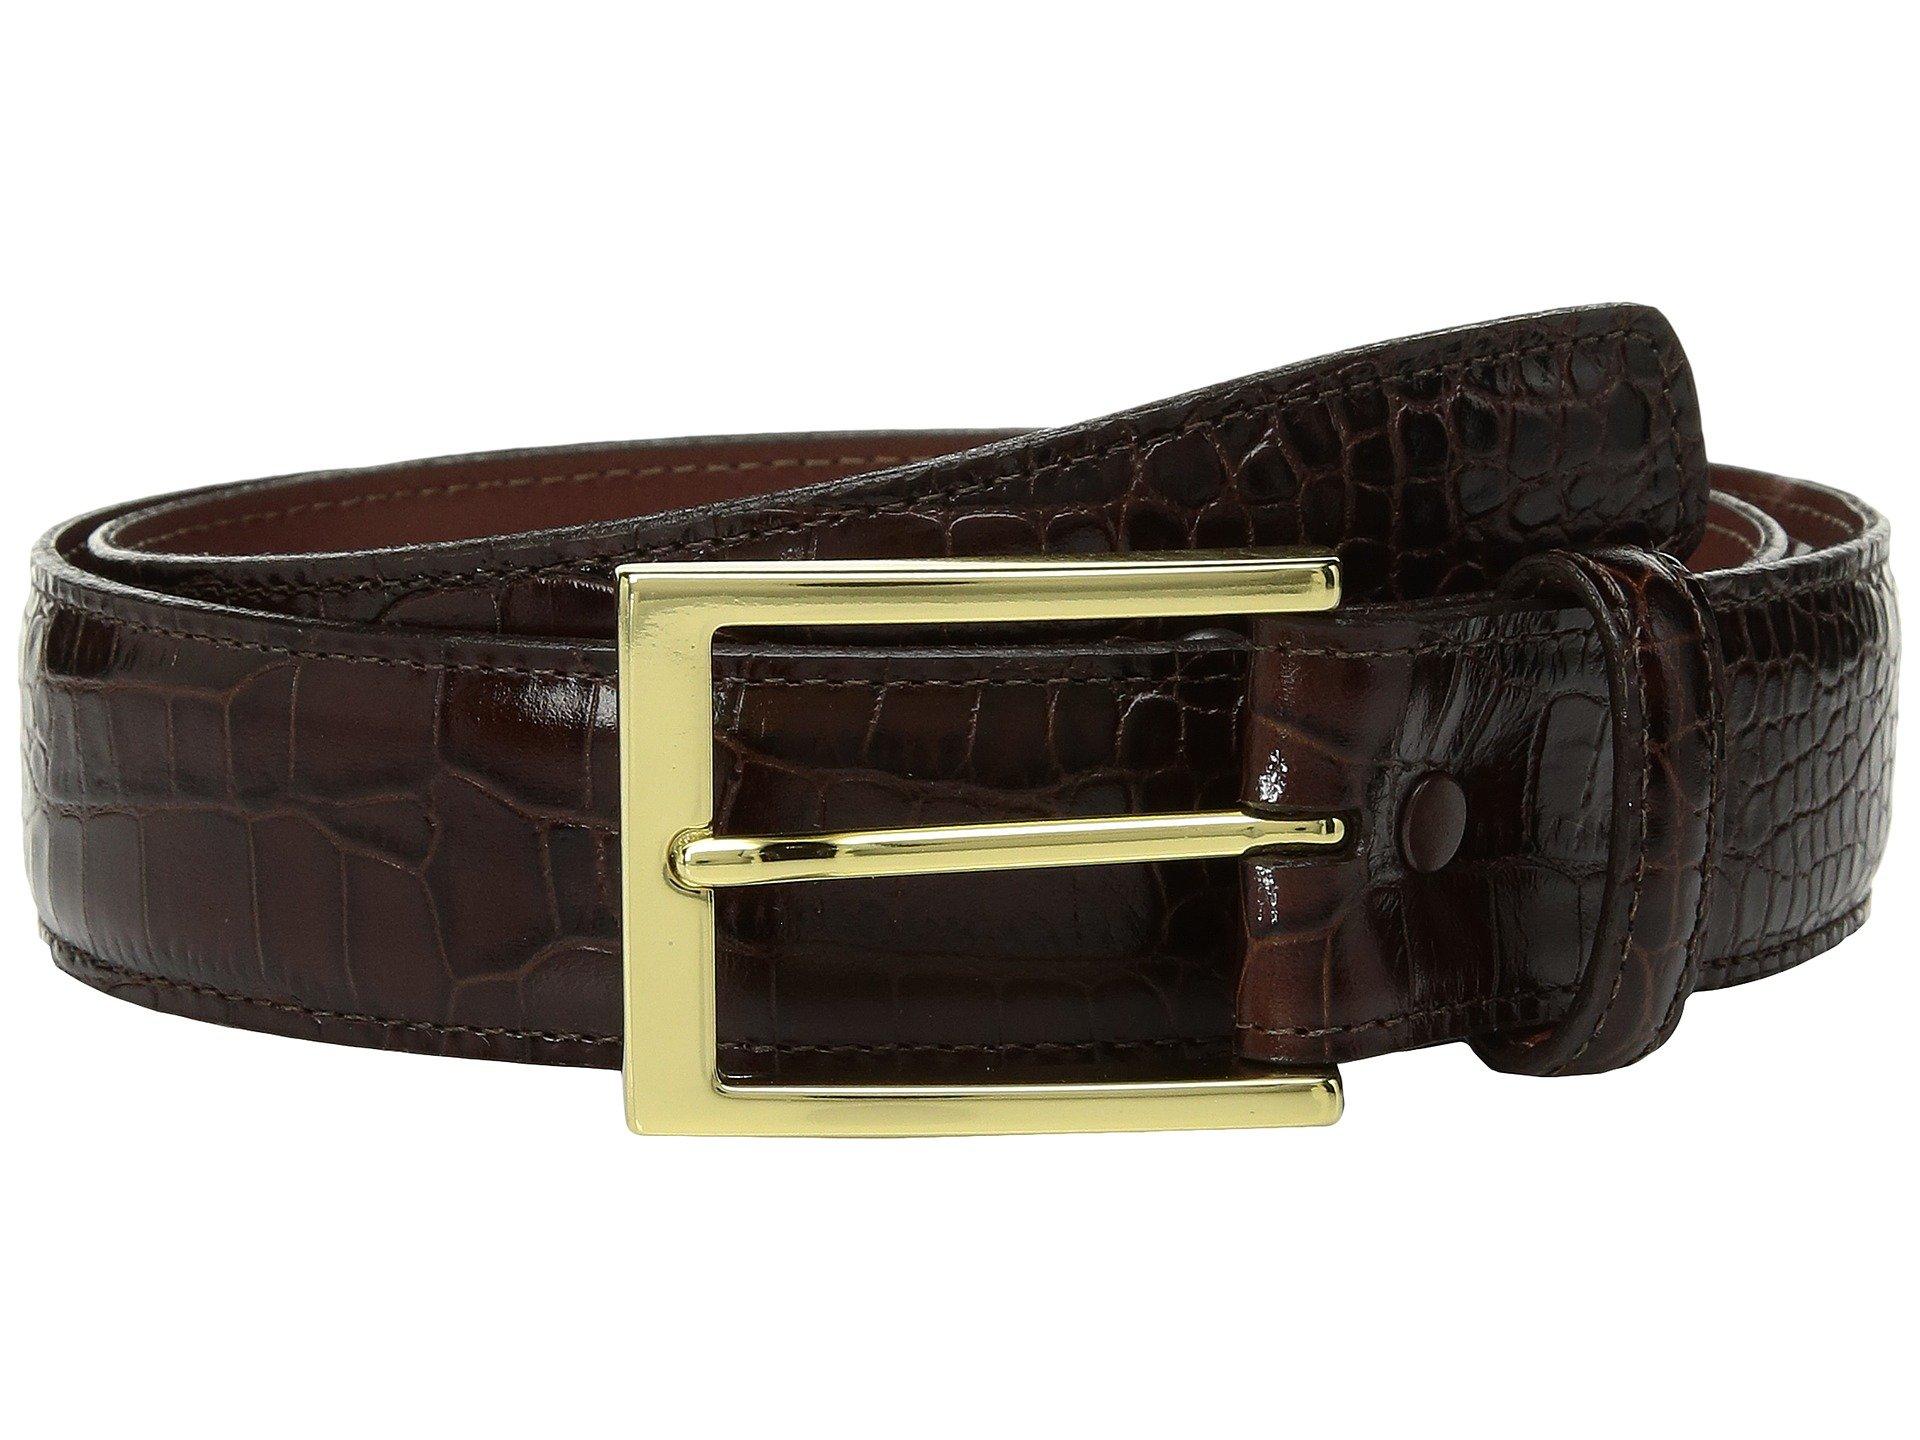 Correa o Cinturon para Hombre Torino Leather Co. 35mm Gator Grain Embossed Calf  + Torino Leather Co. en VeoyCompro.net